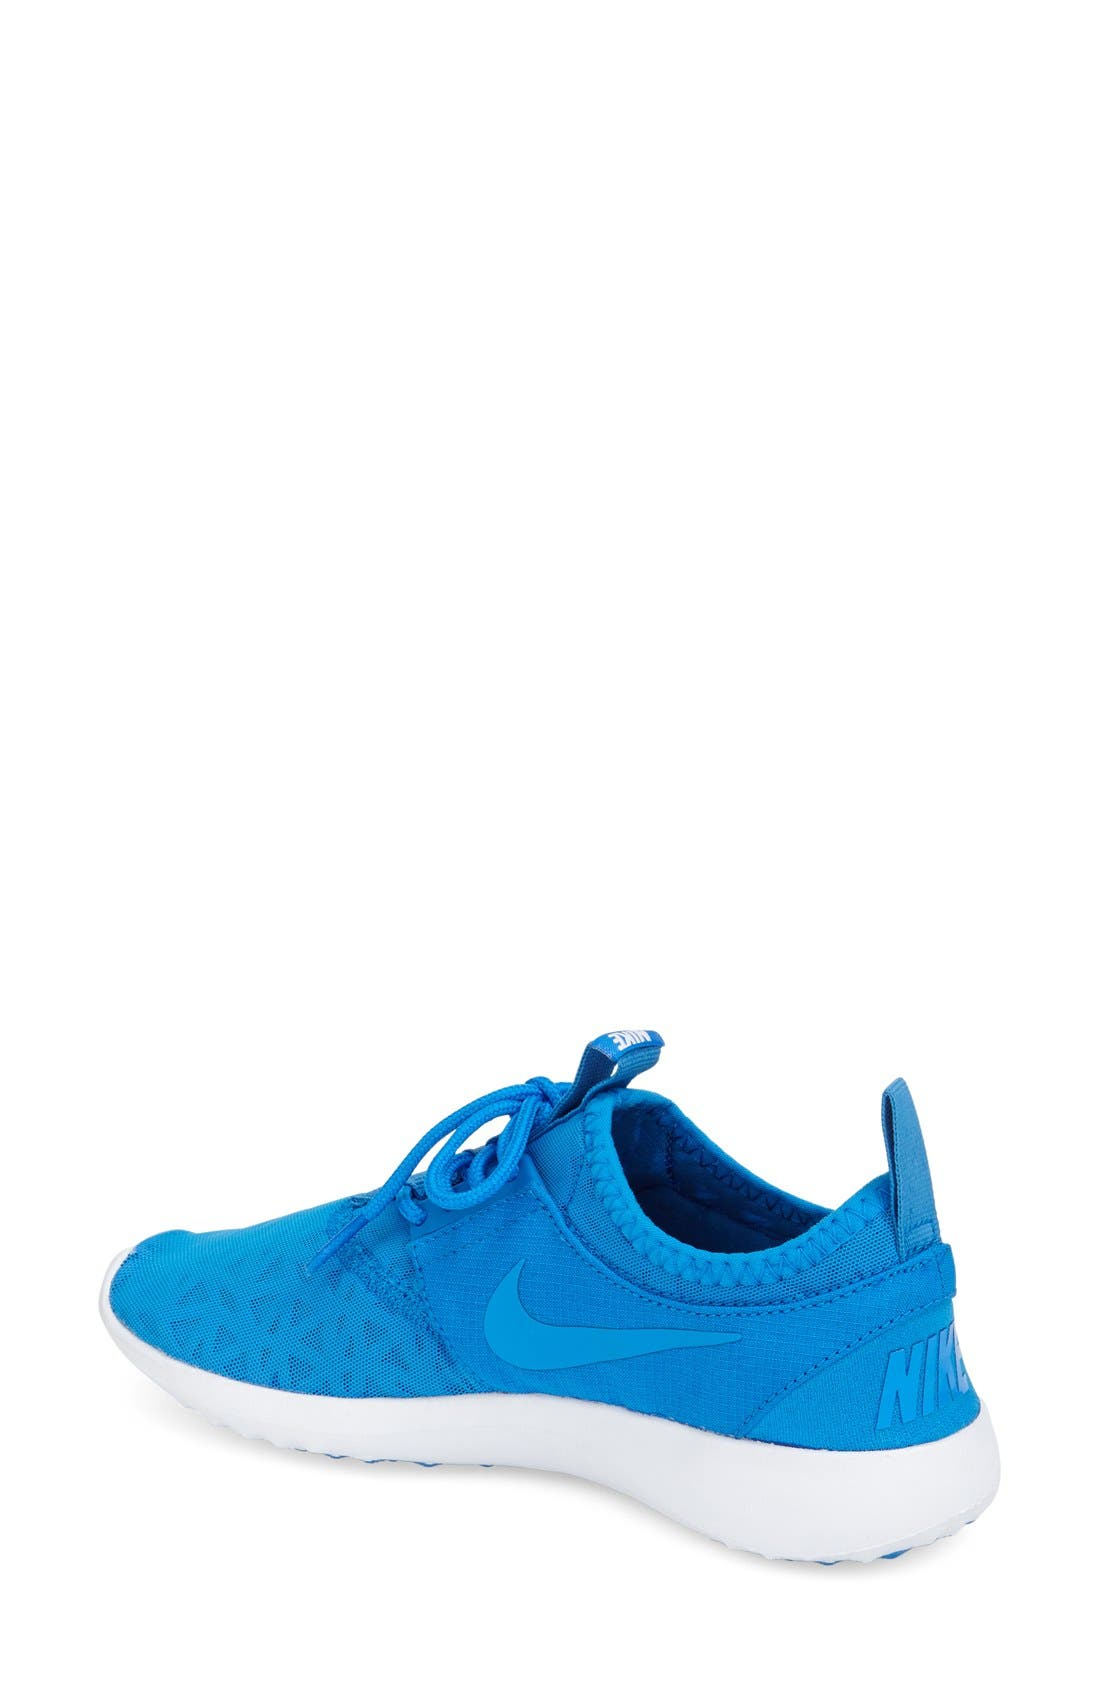 Juvenate Sneaker,                             Alternate thumbnail 99, color,